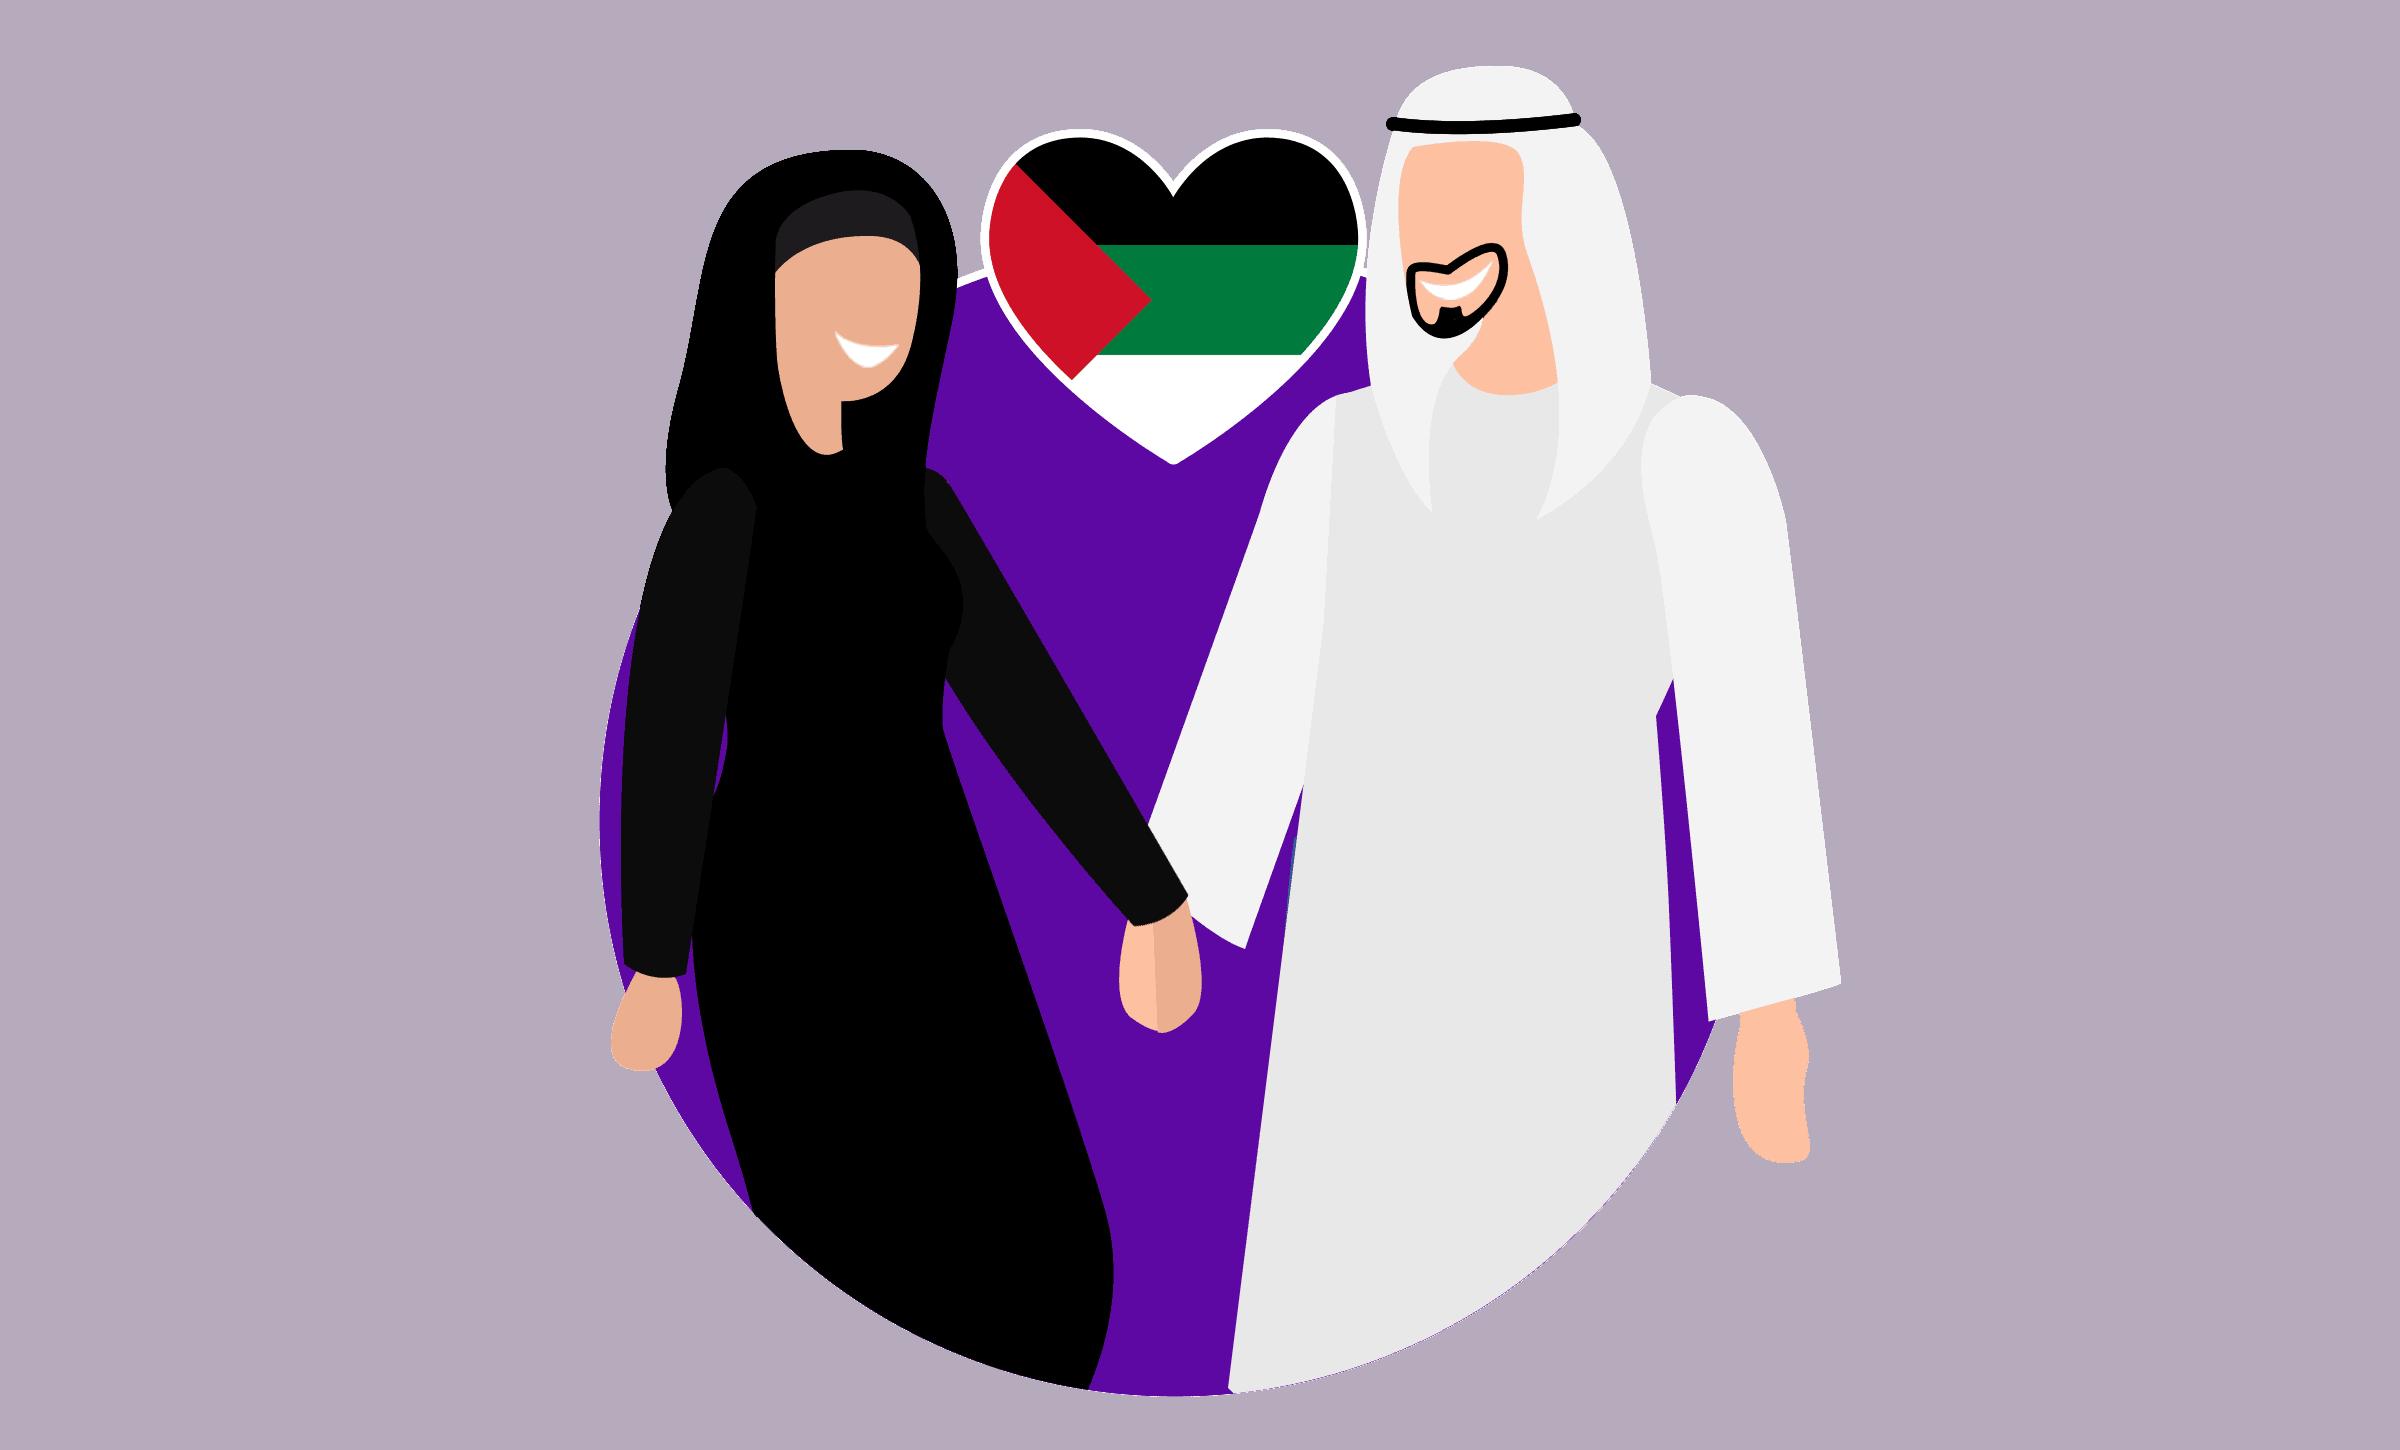 Dating Site 100 Flirtul musulman liber in Islam